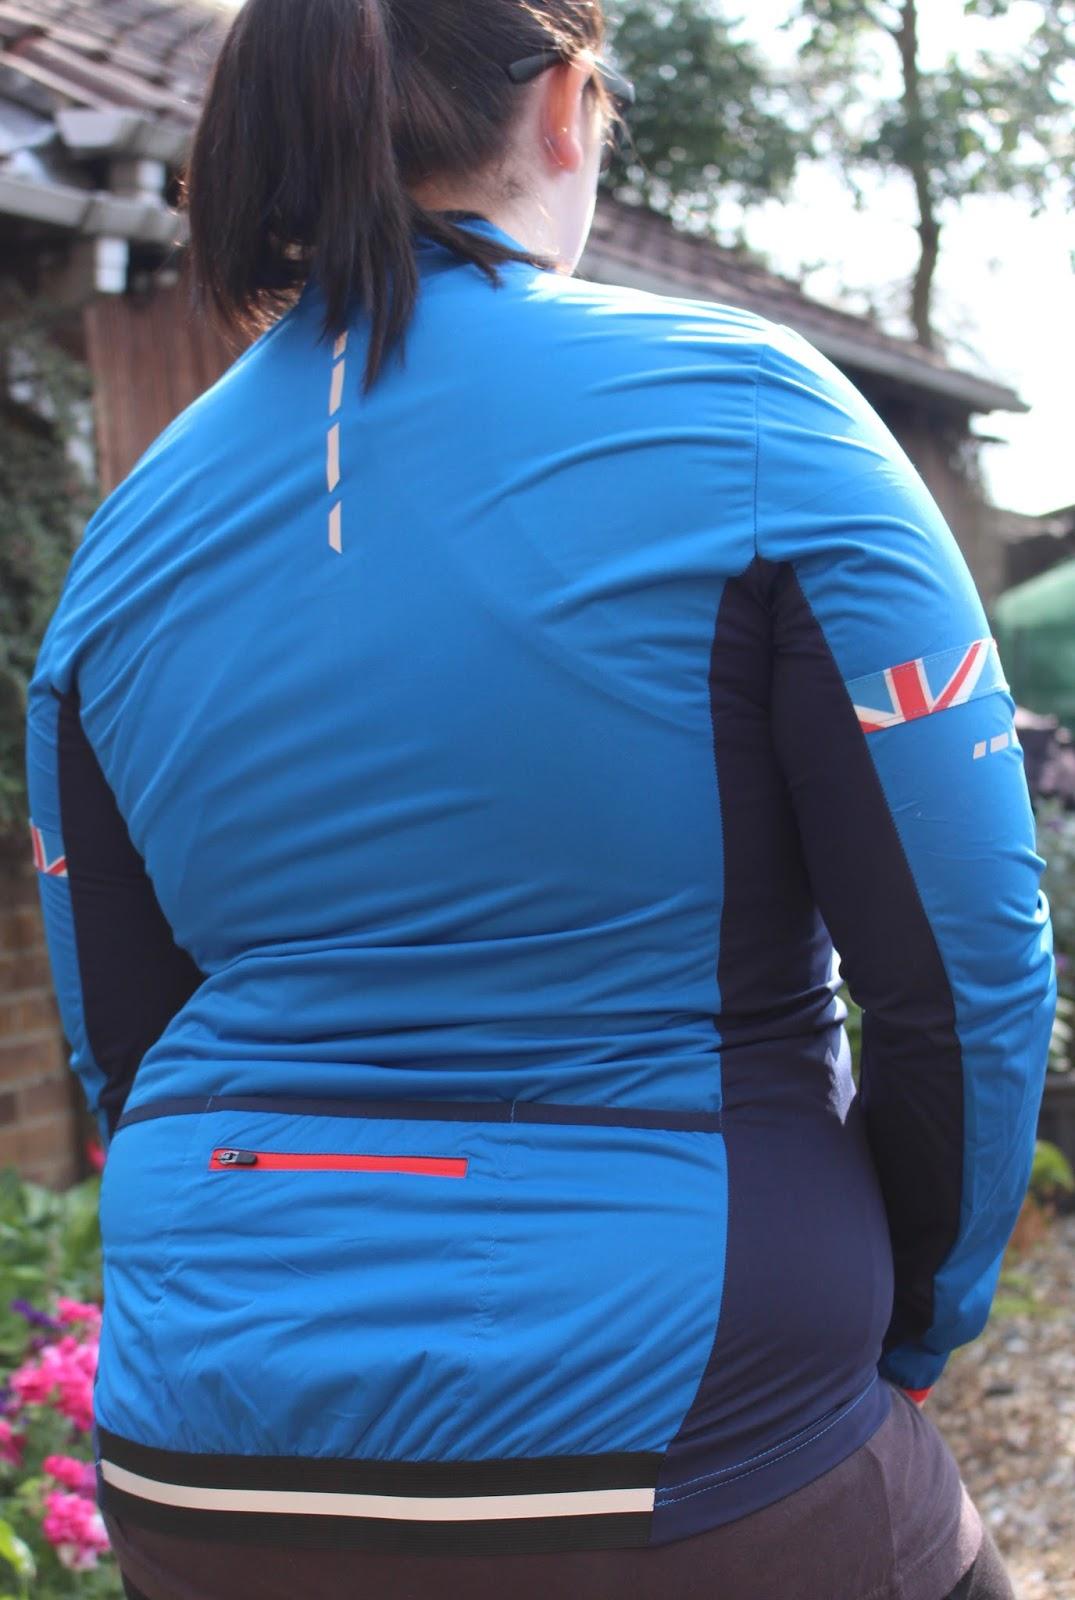 Team gb cycling jacket blue size 18